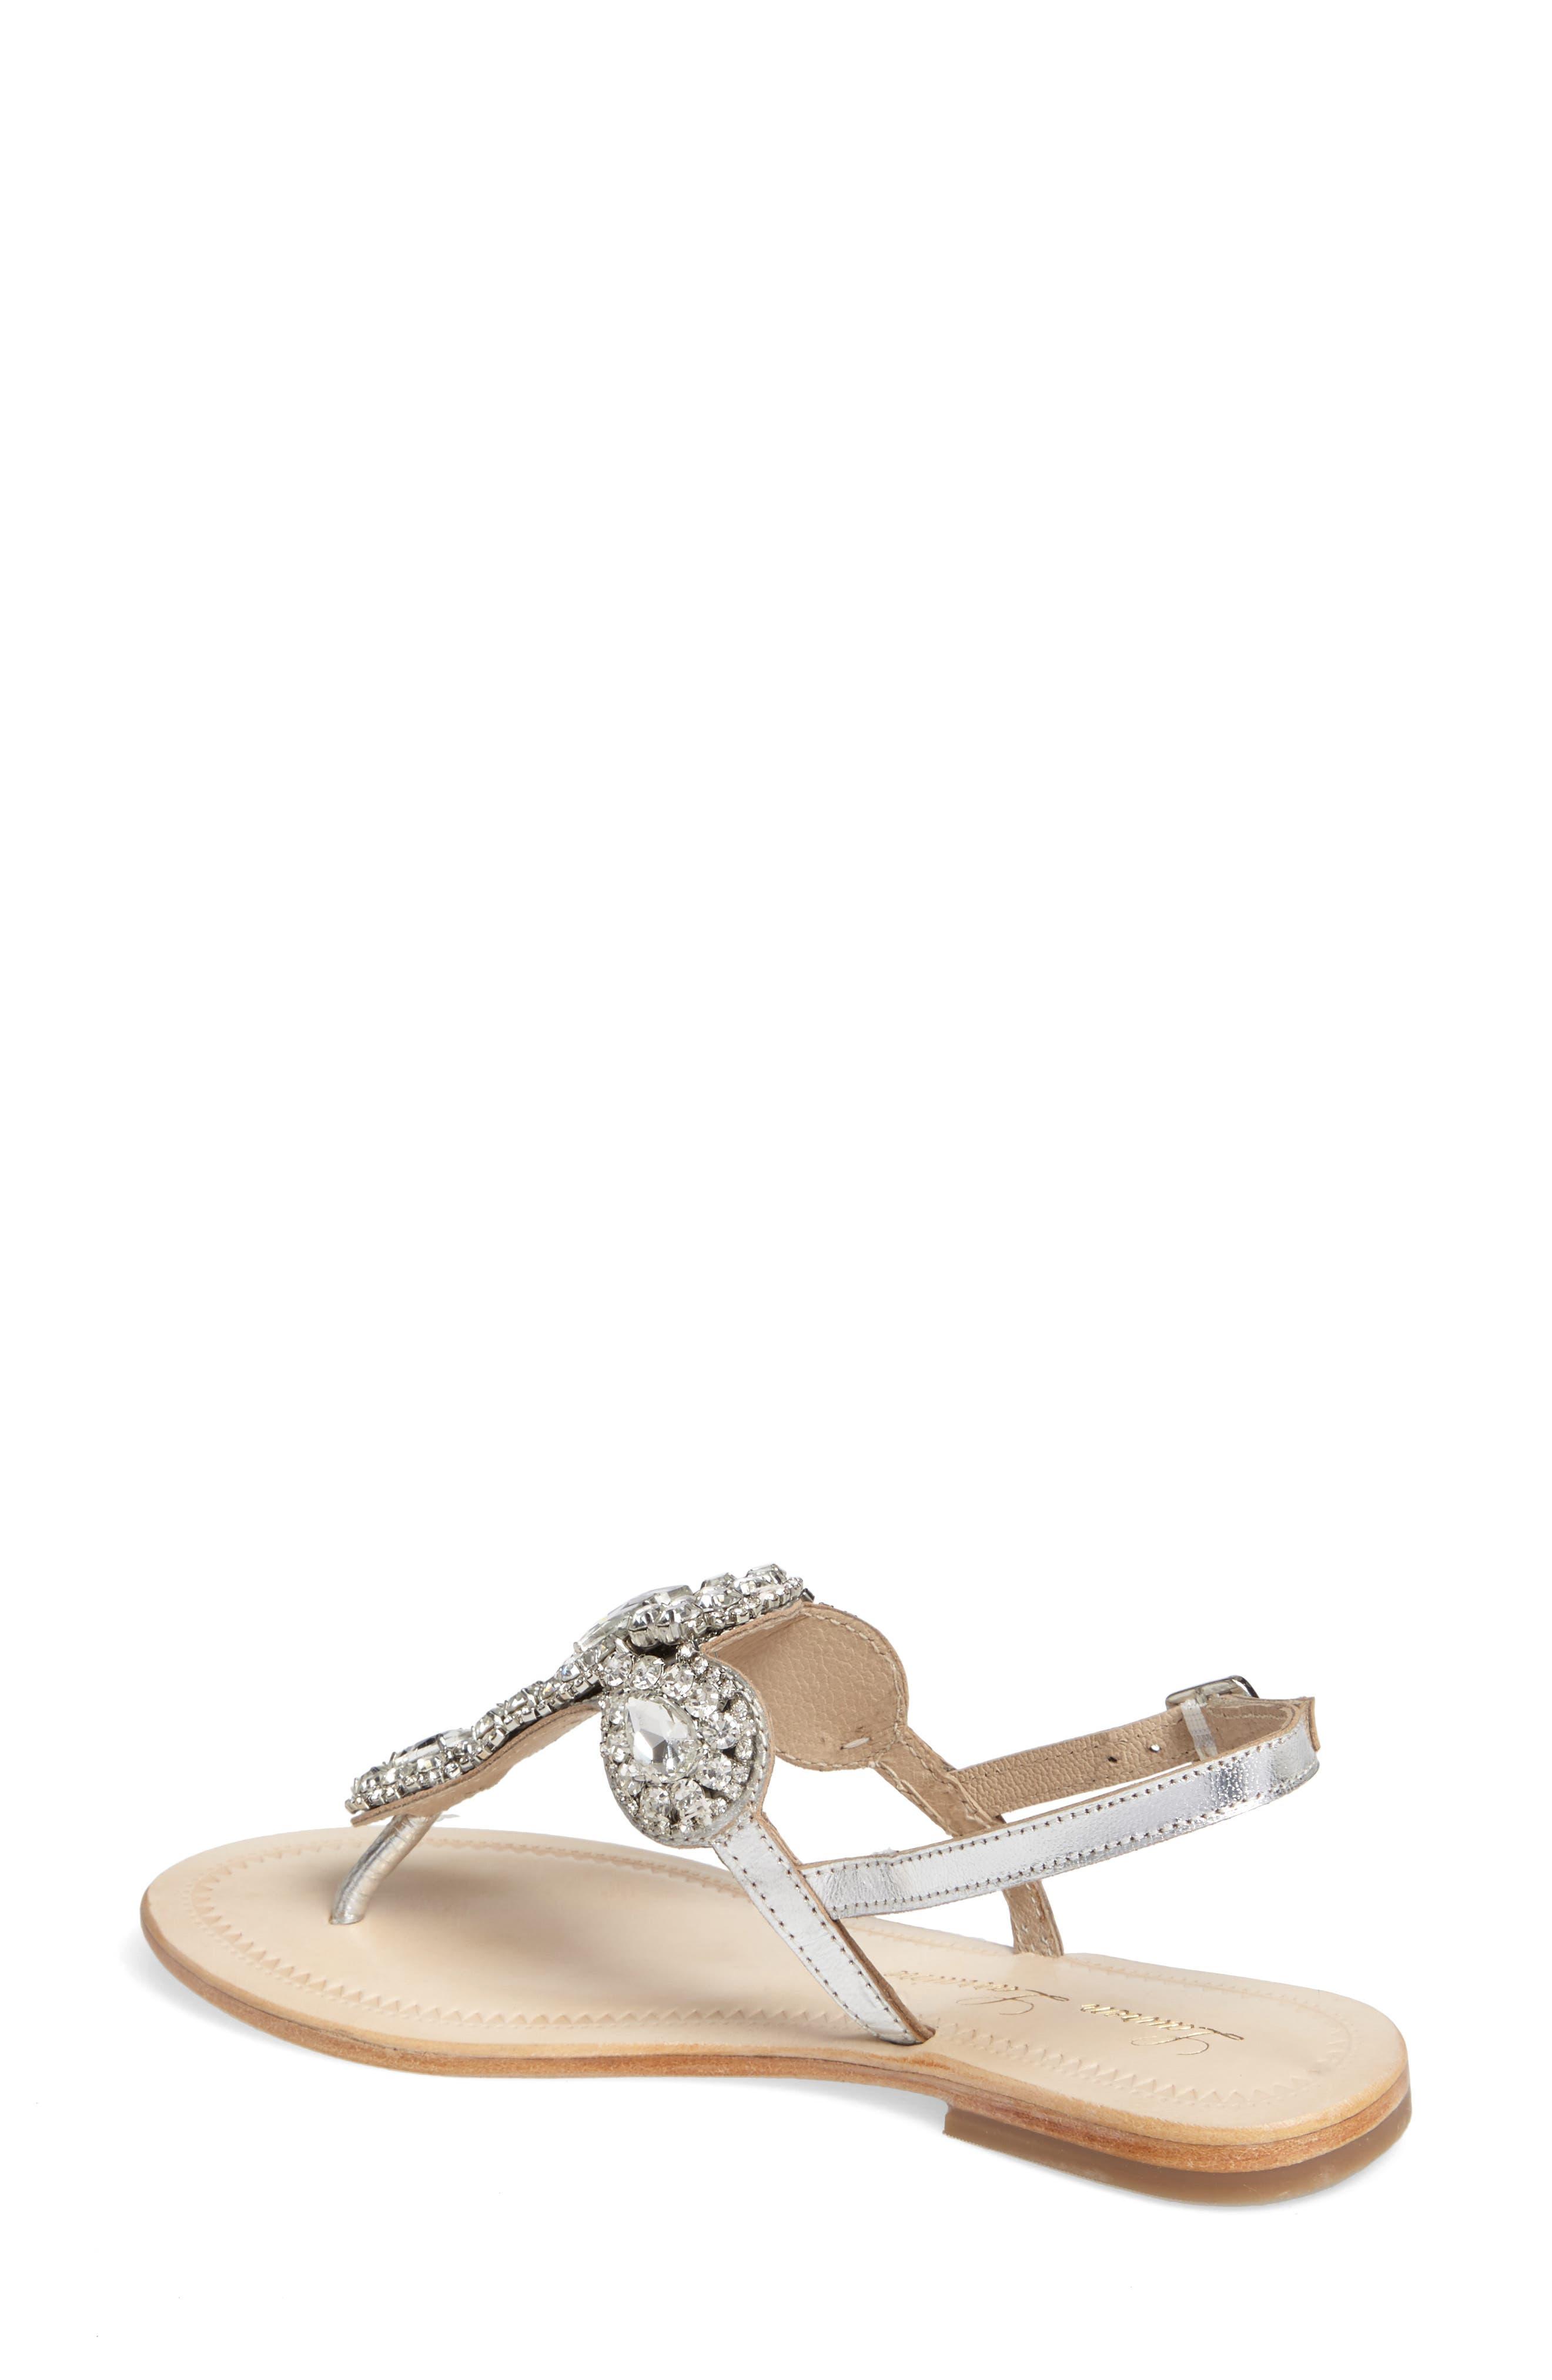 Alternate Image 2  - Lauren Lorraine Bahama Crystal Embellished Sandal (Women)